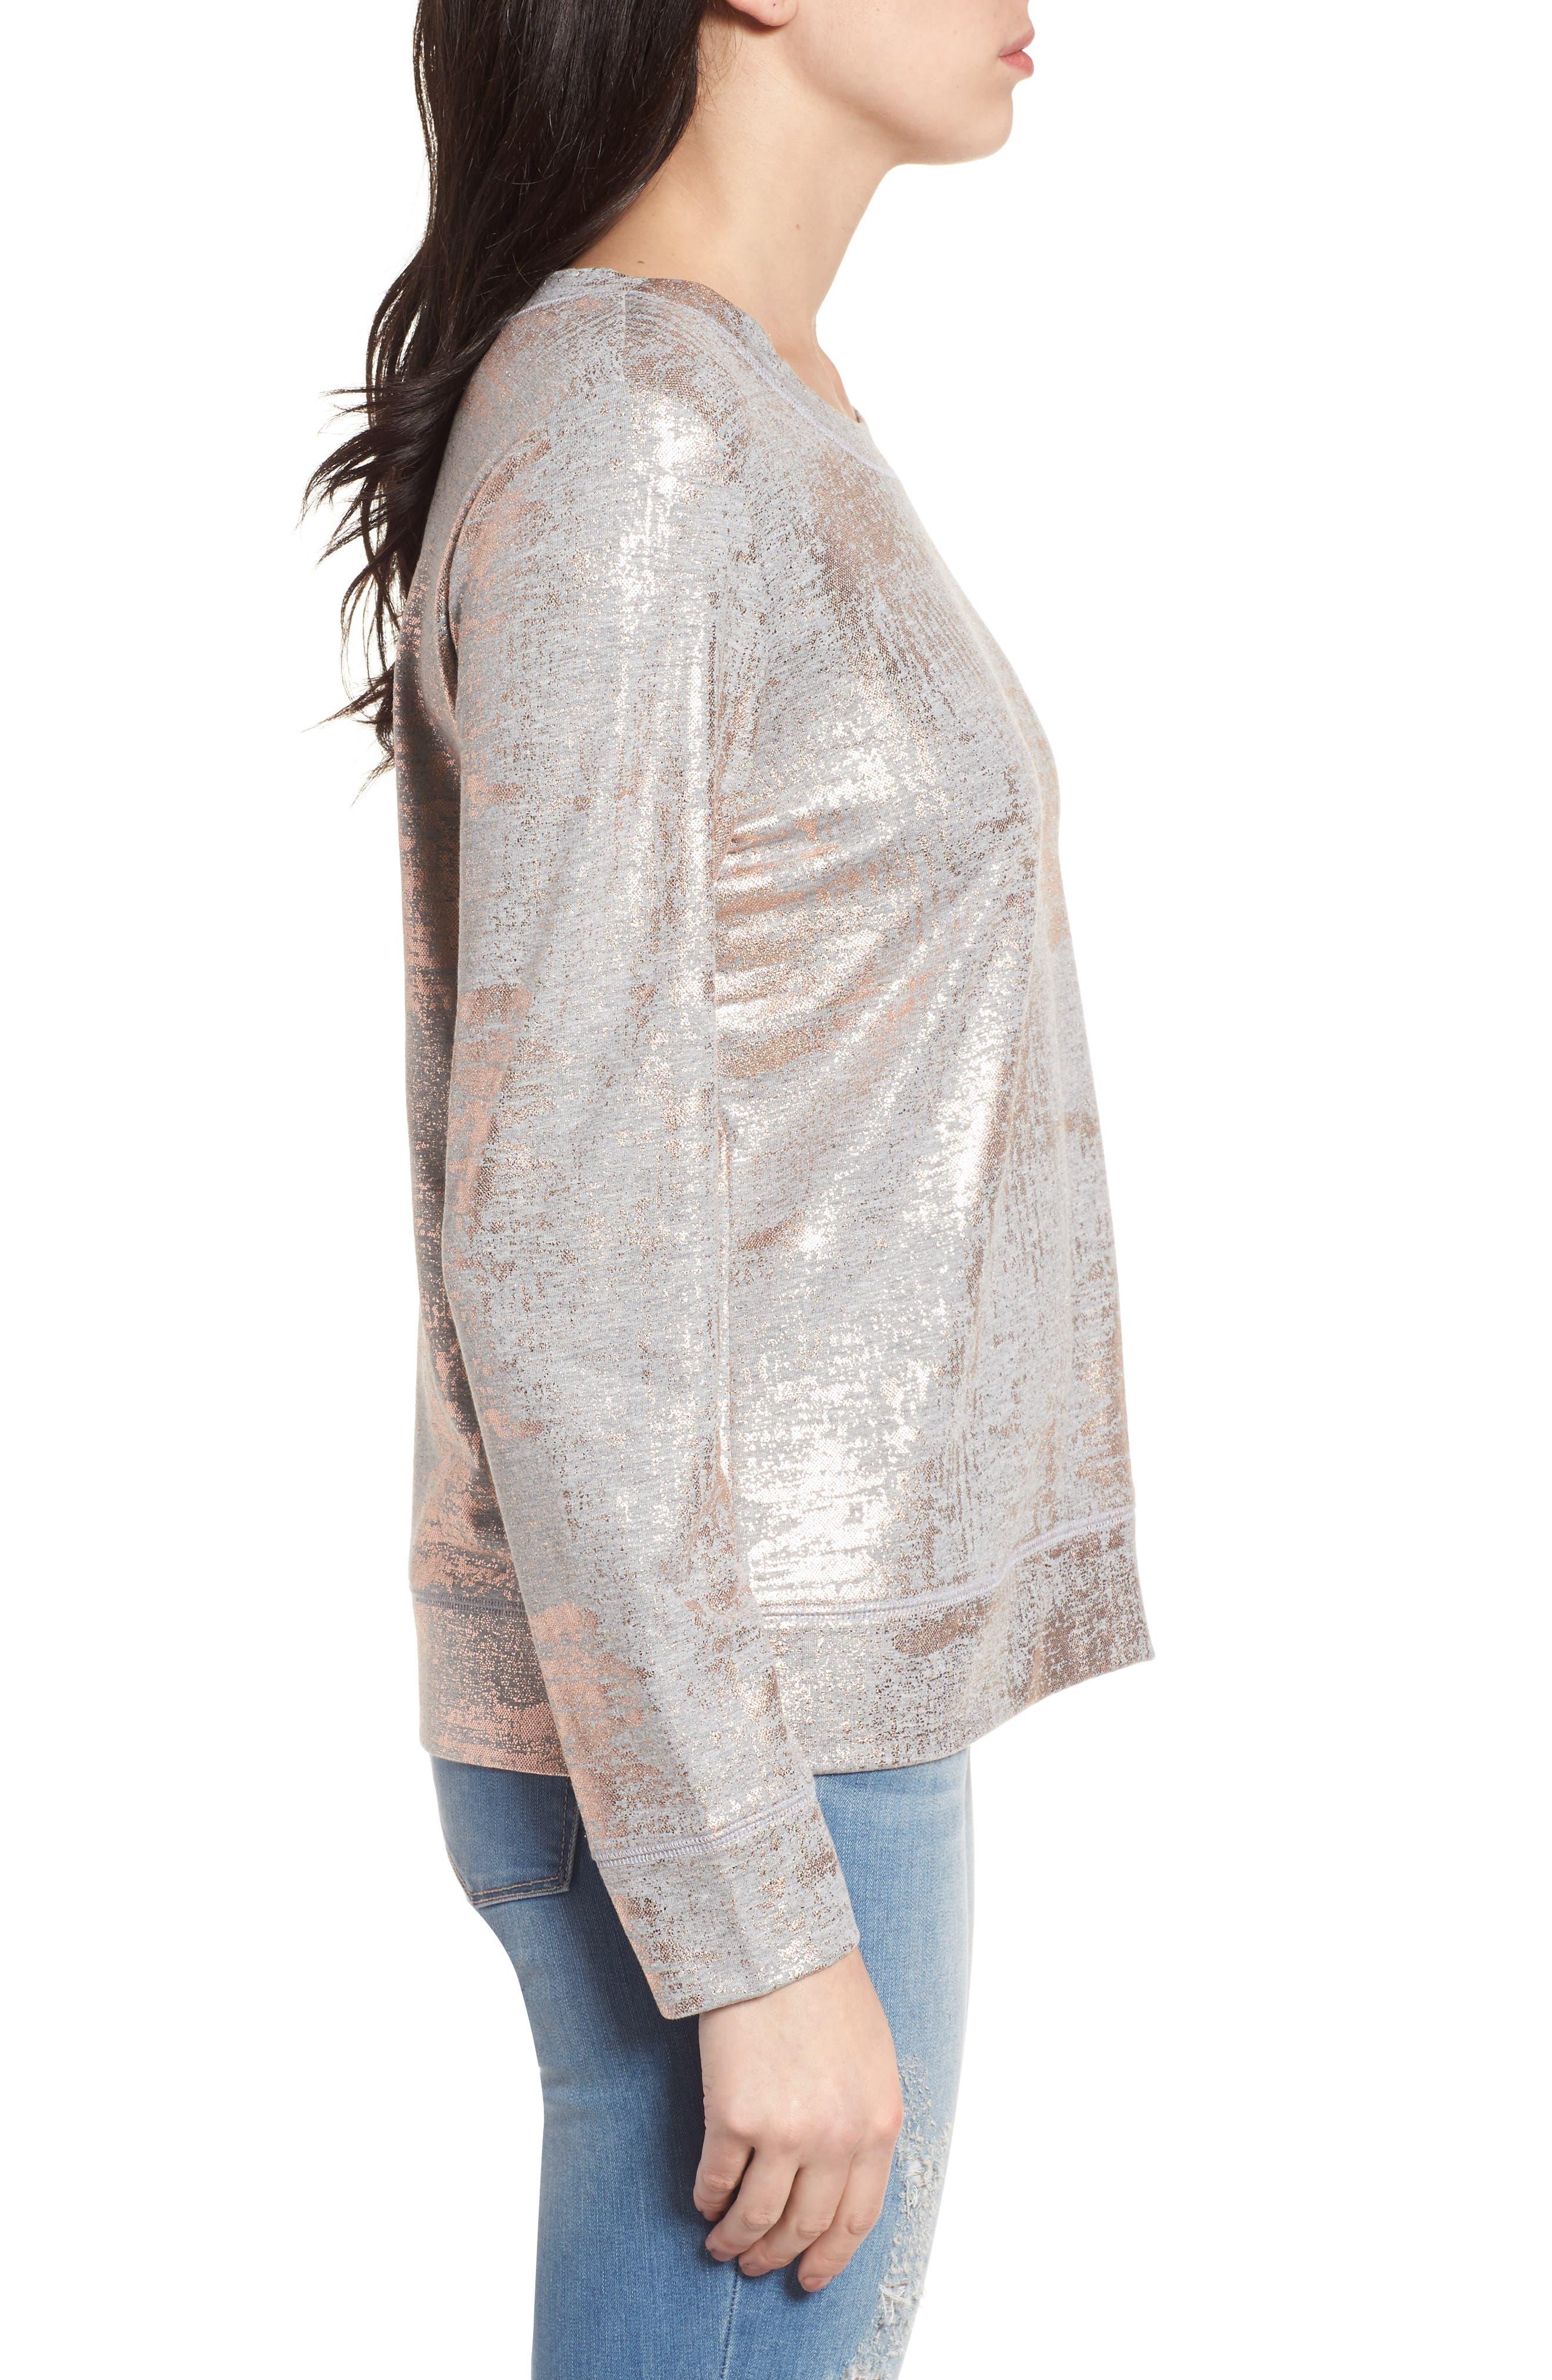 Foiled Sweatshirt,                             Alternate thumbnail 3, color,                             020